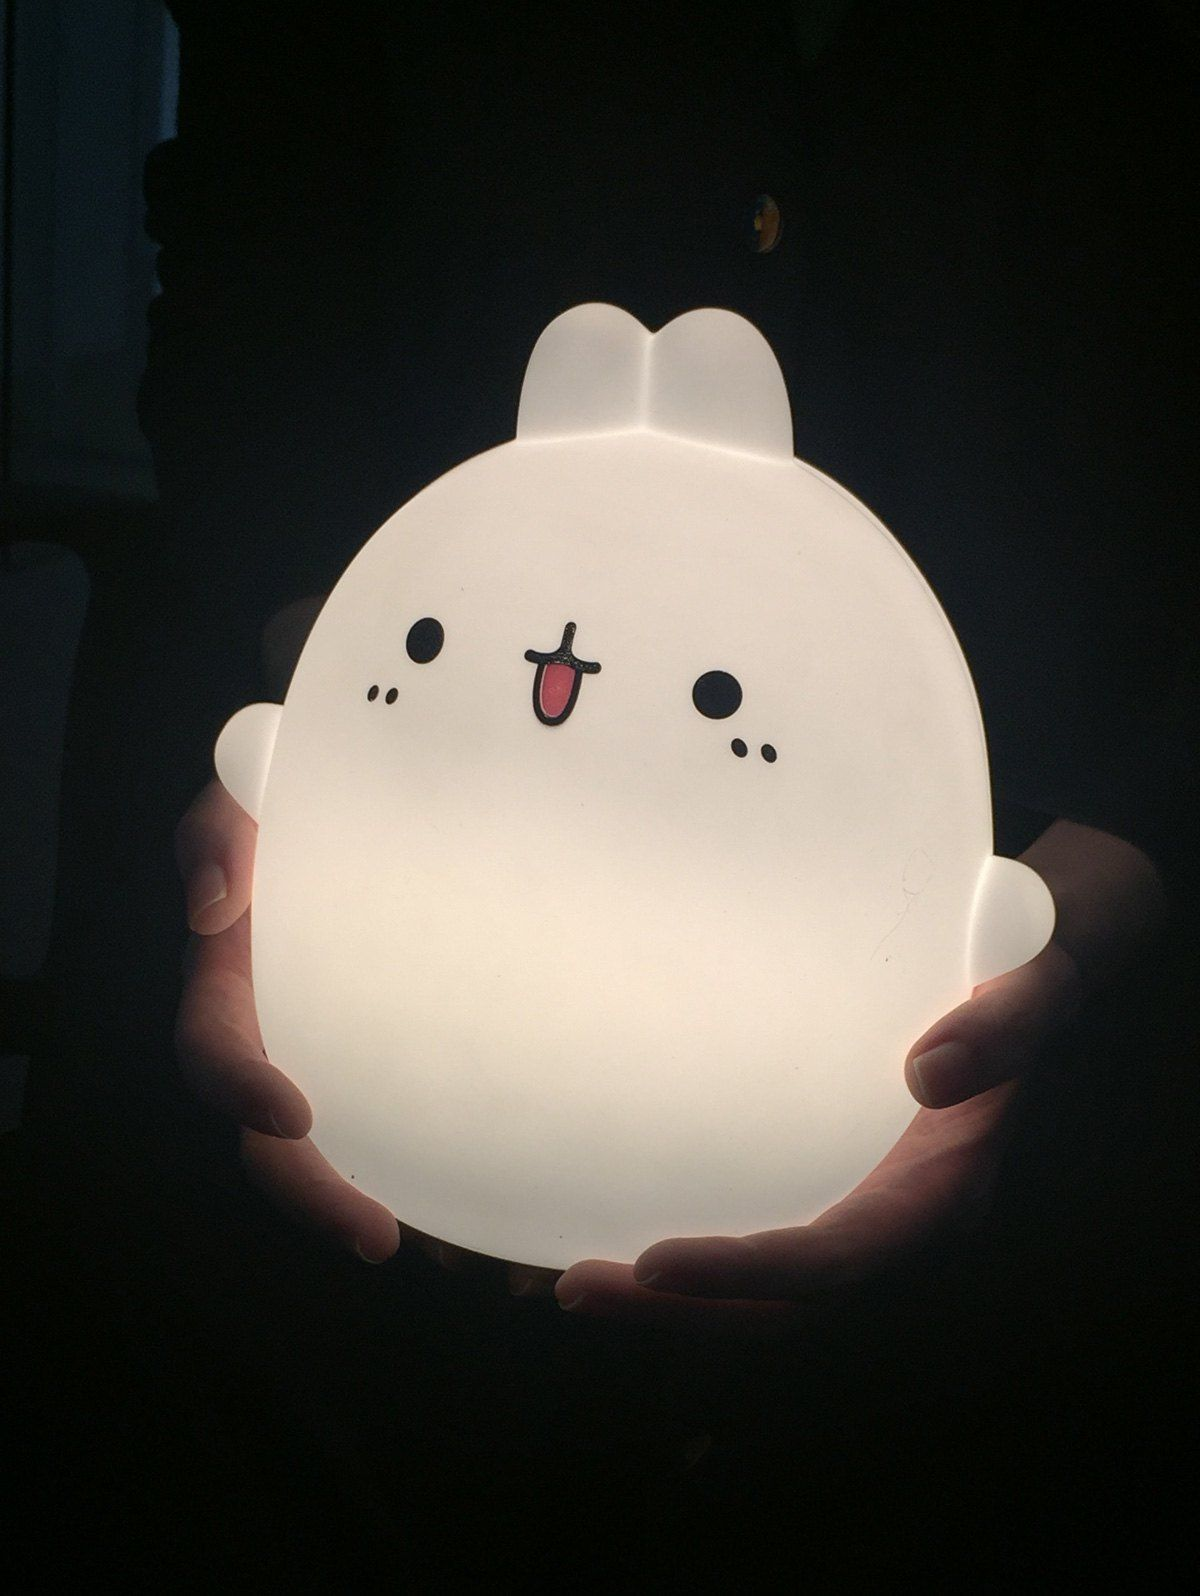 Lampe De Chevet Led Usb Telecommandee Coloree En Silice Motif Animation Colore Cute Night Lights Night Light Kawaii Room